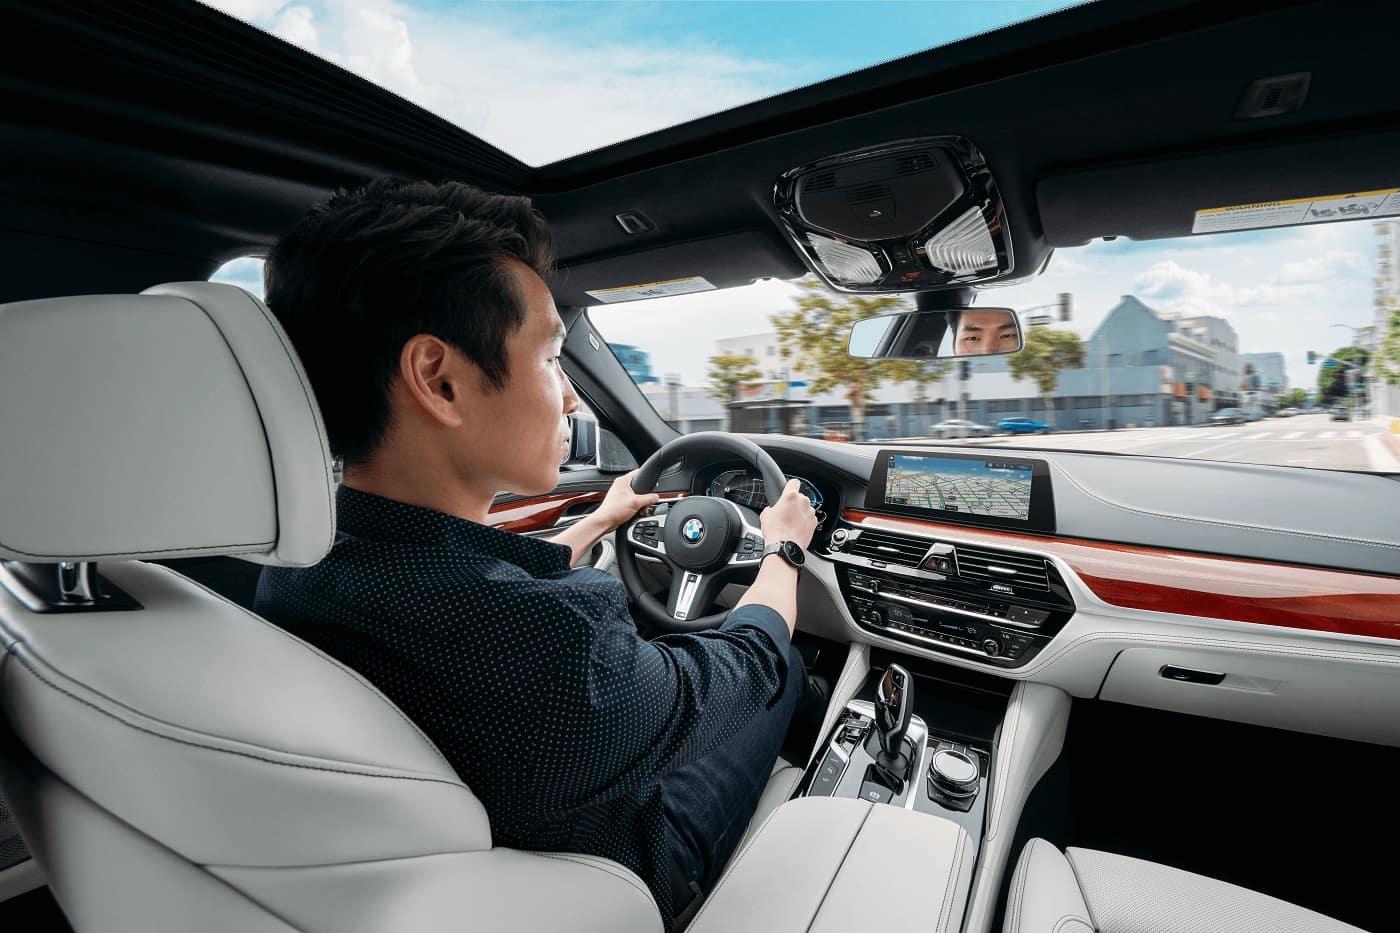 BMW 5 Series Interior Technology Lancaster PA